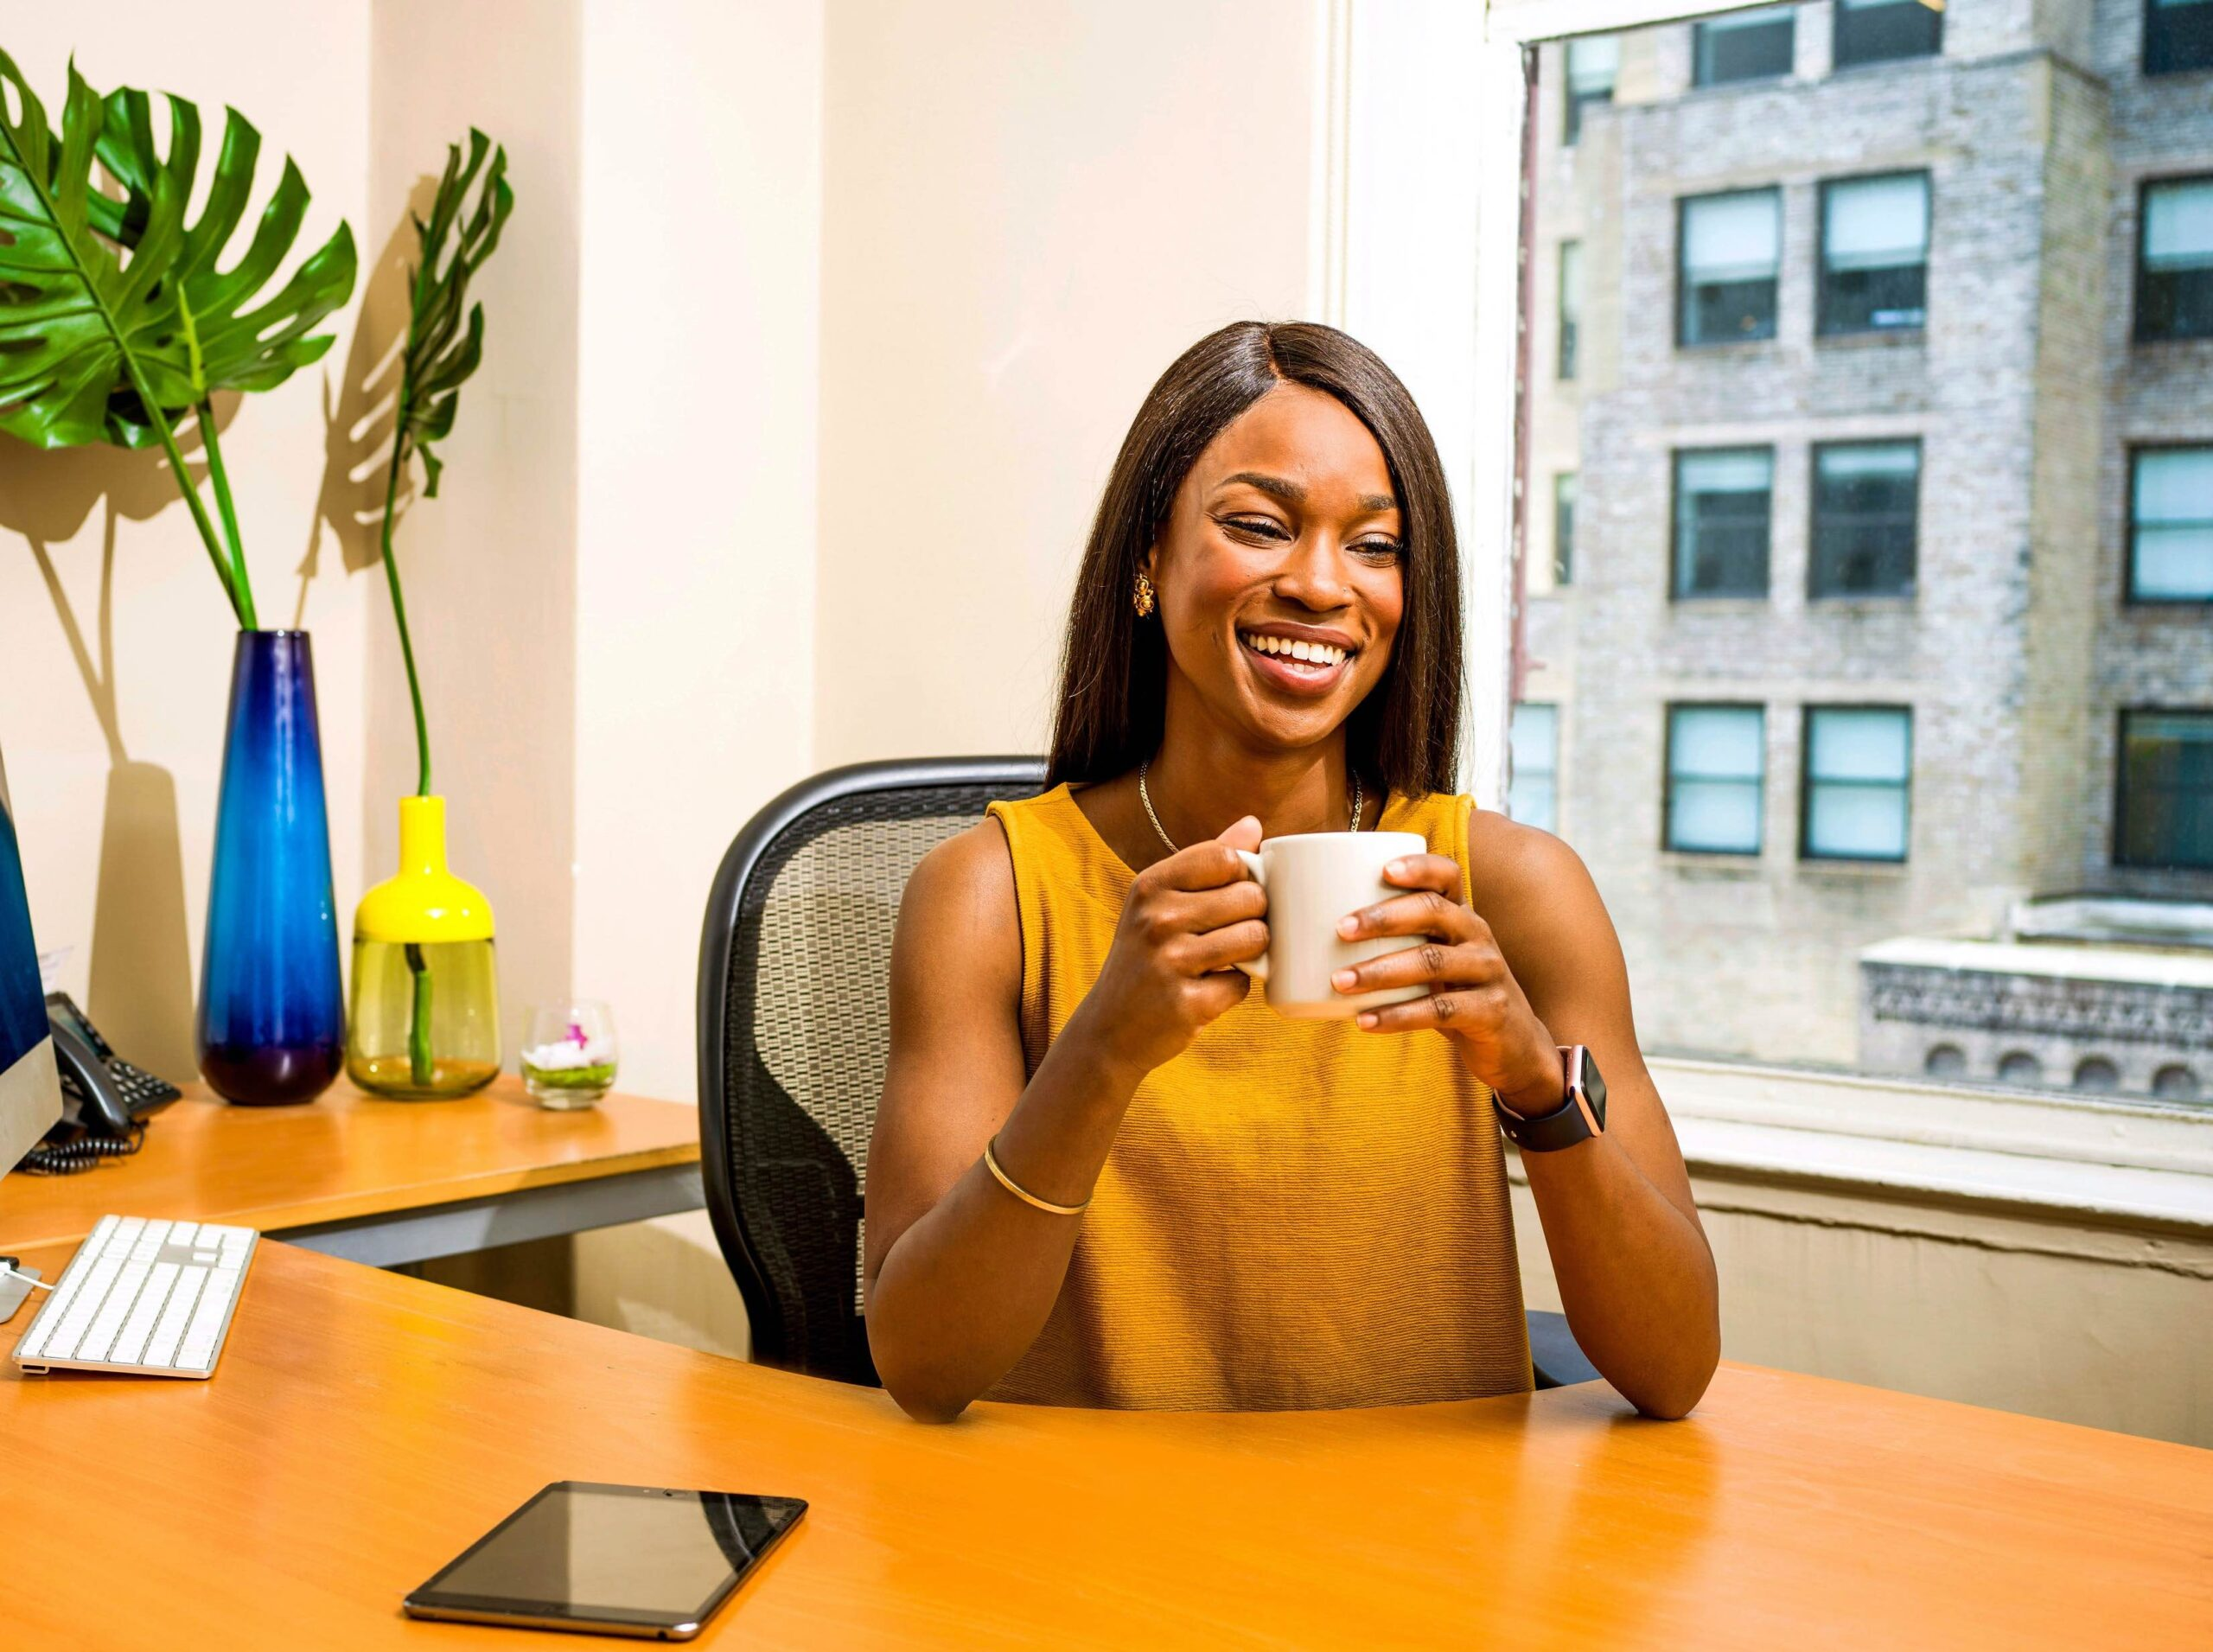 black women at work PPP Loans